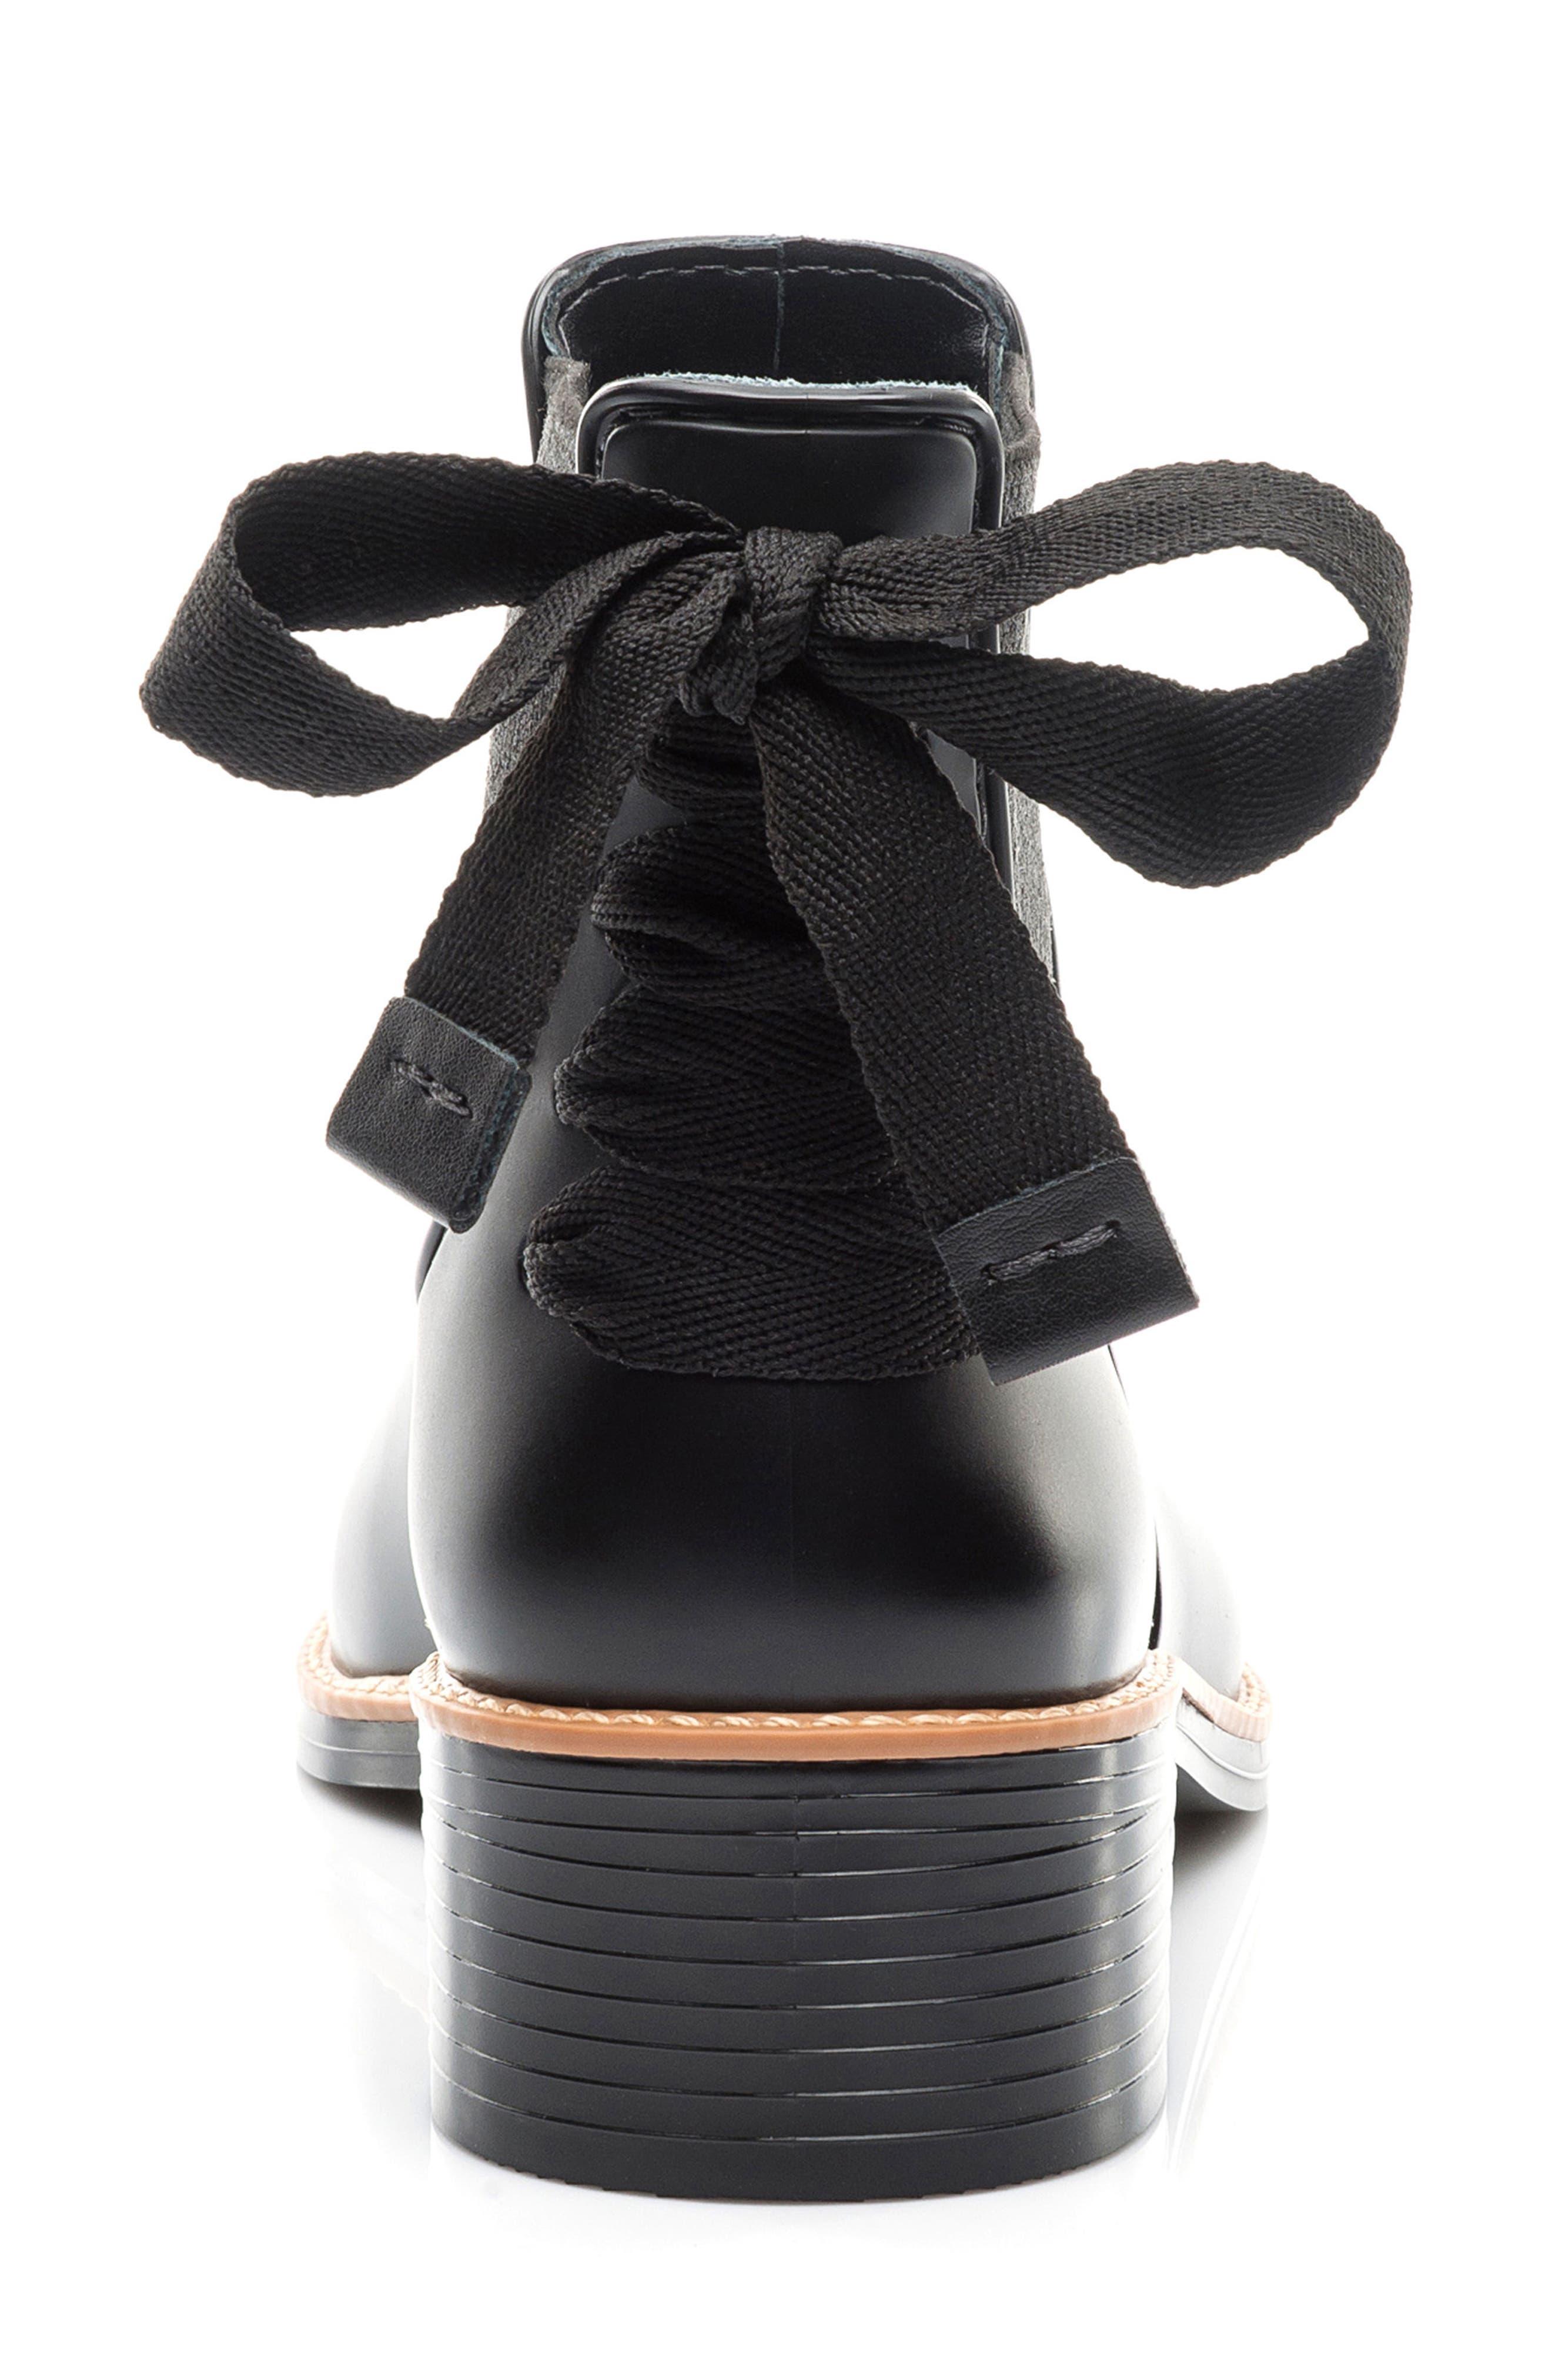 BERNARDO, Paxton Waterproof Rain Boot, Alternate thumbnail 7, color, BLACK